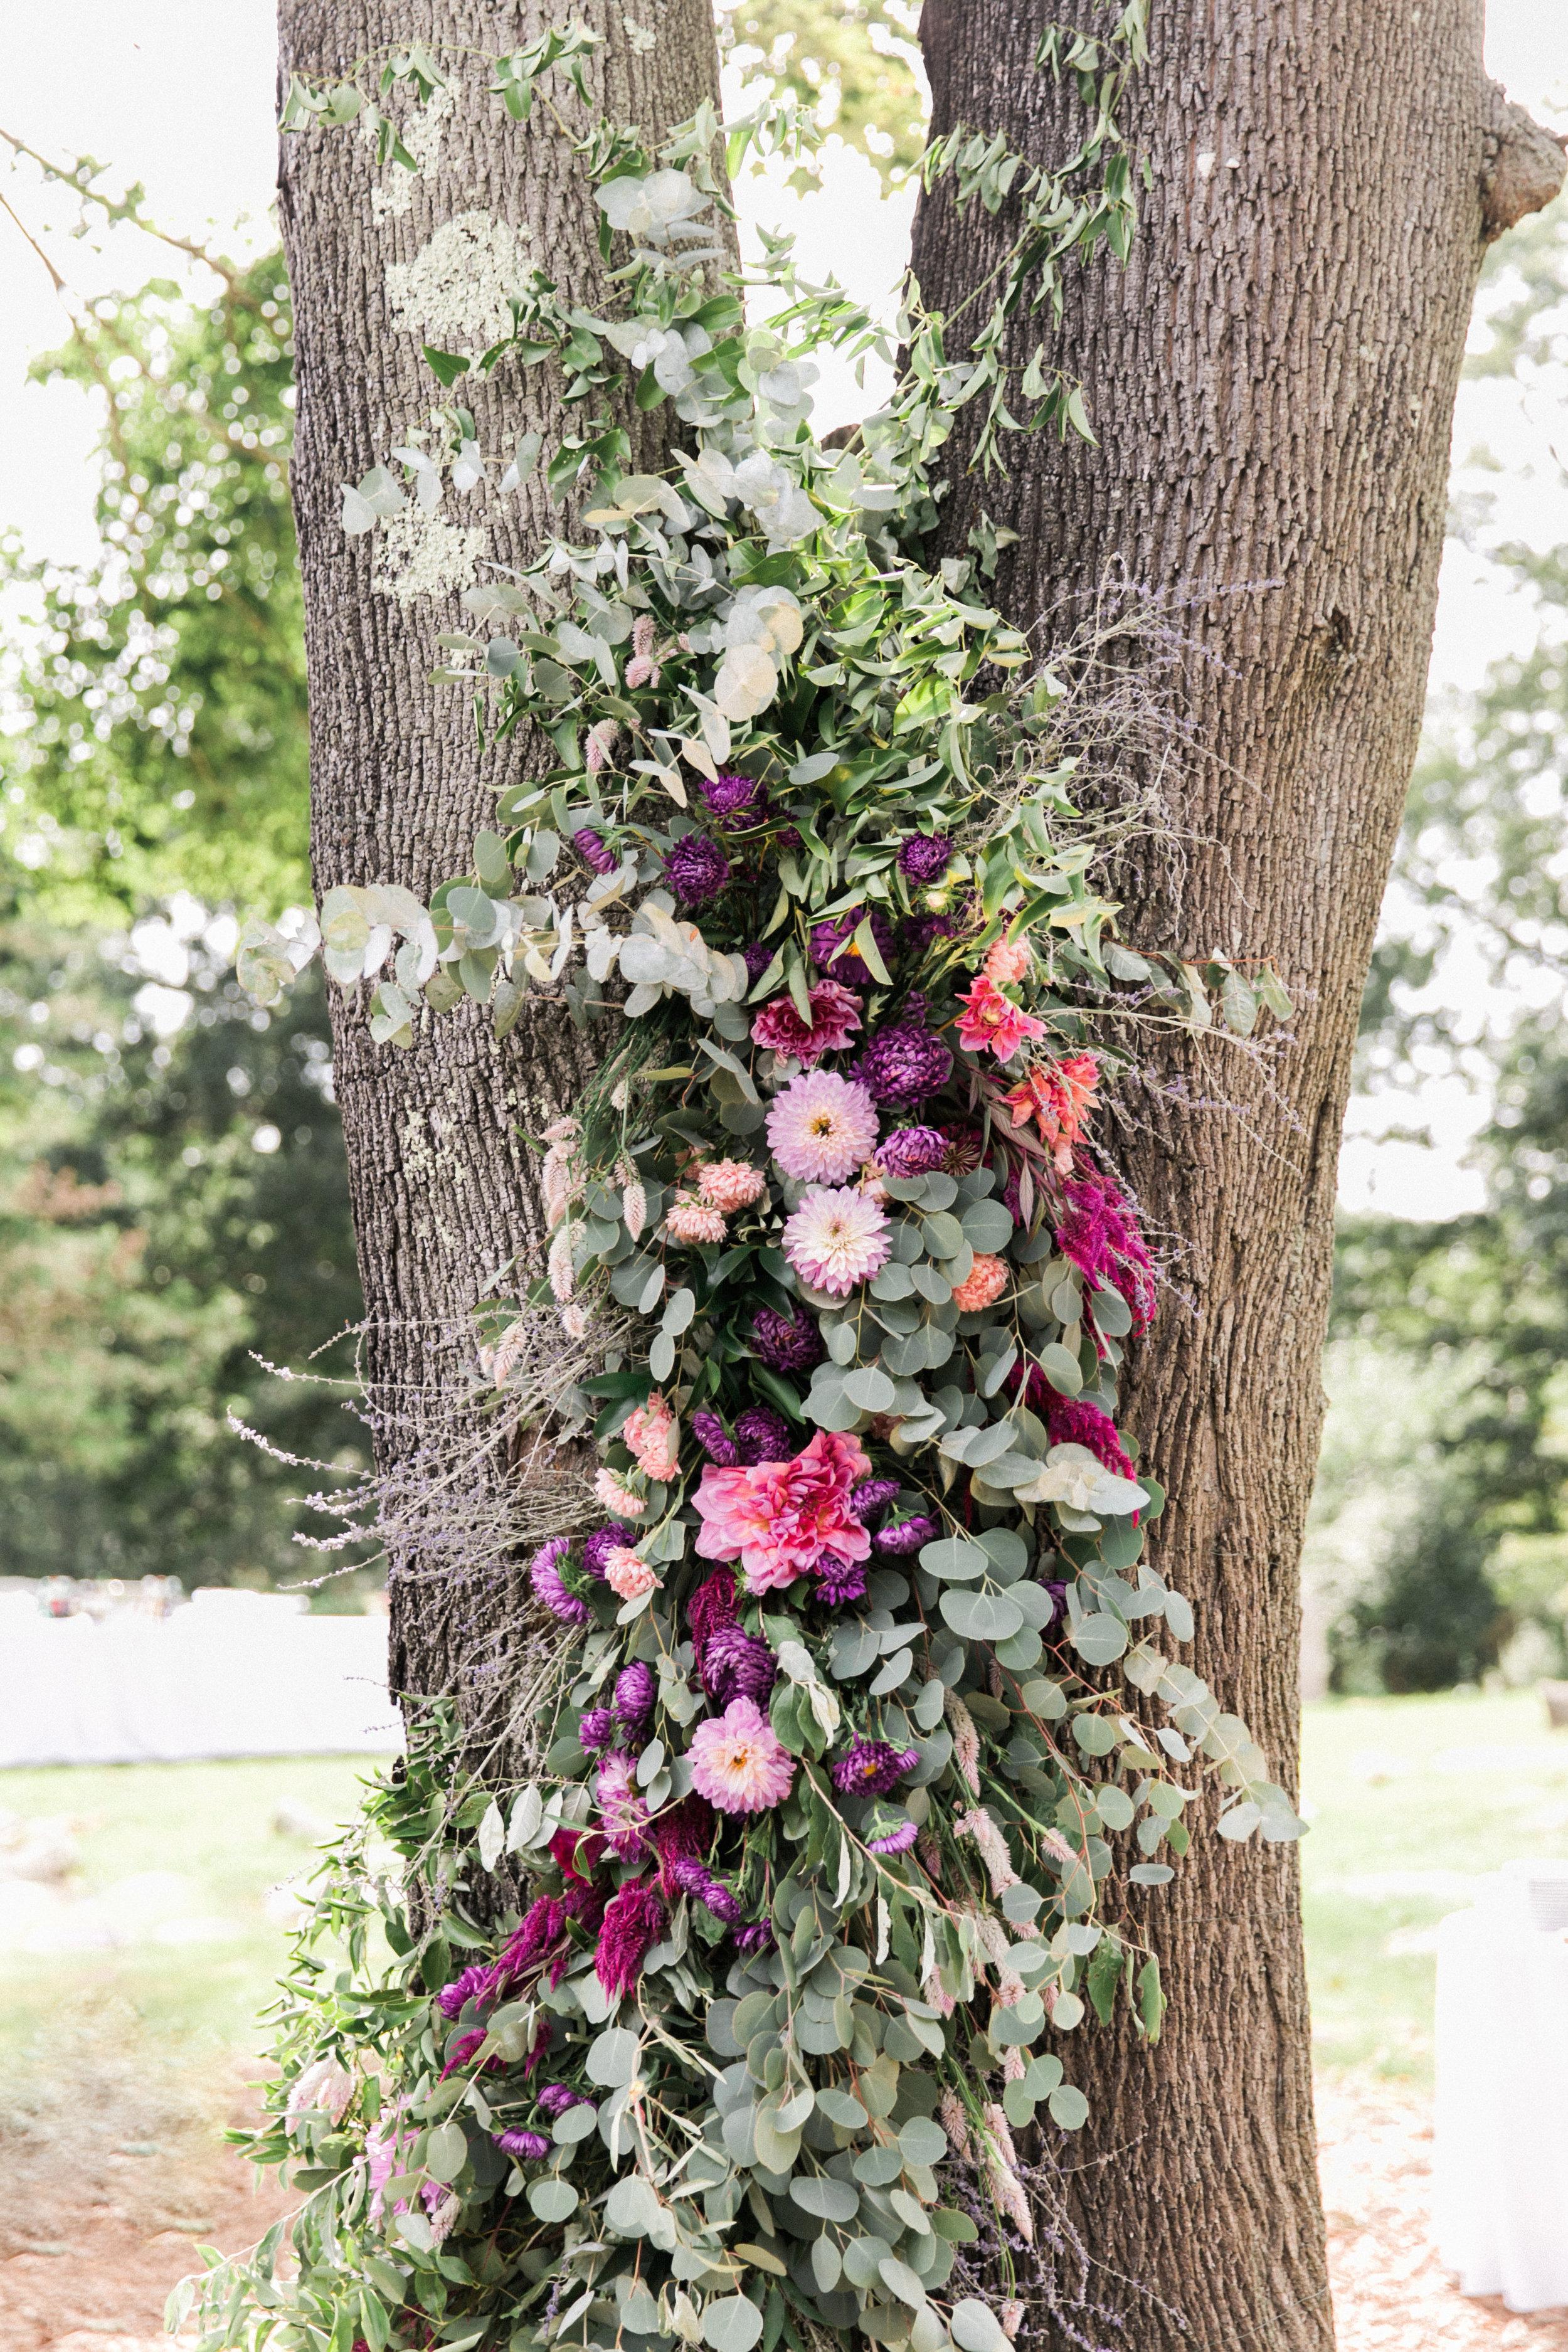 Barberry-Hill-Farm-Wedding-Madison-CT-Emily-and-Dan-August-2018-Connecticut-Wedd-0002.jpg